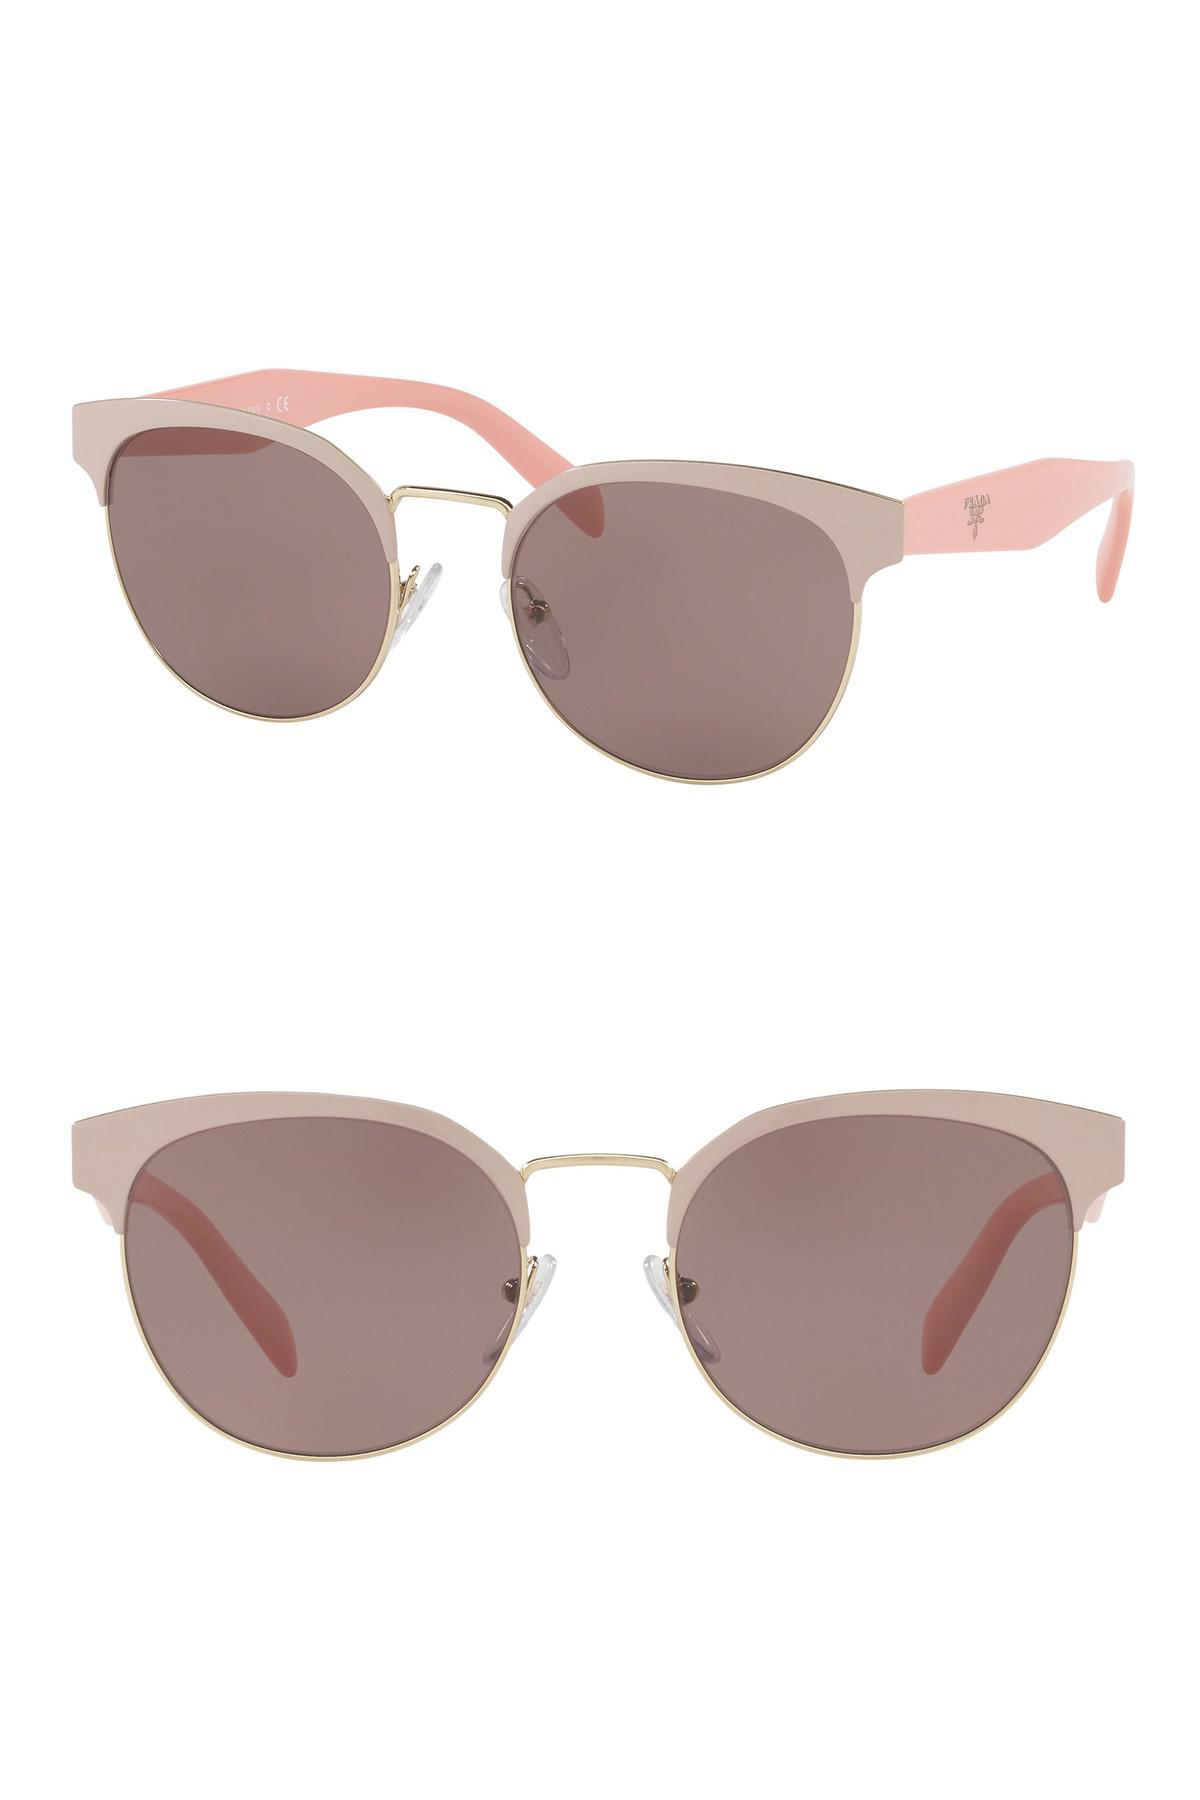 ee76680b329 Lyst - Prada 54mm Gradient Round Sunglasses in Natural